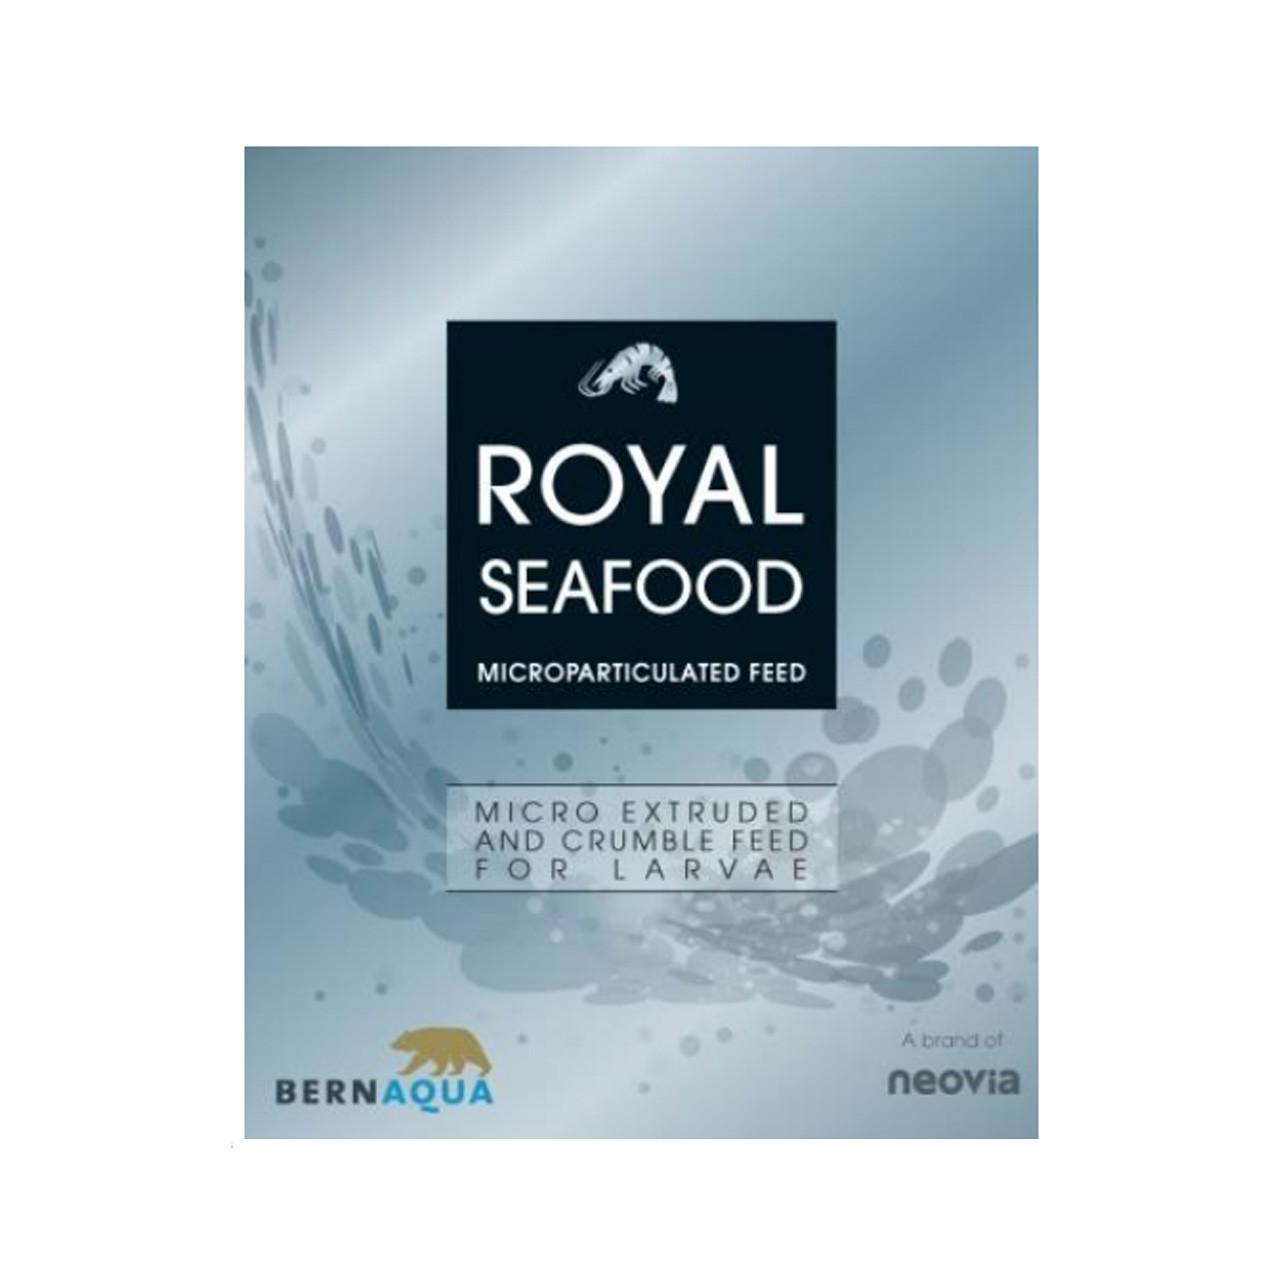 Royal Seafood alimento para post-larvas de camarón BernAqua